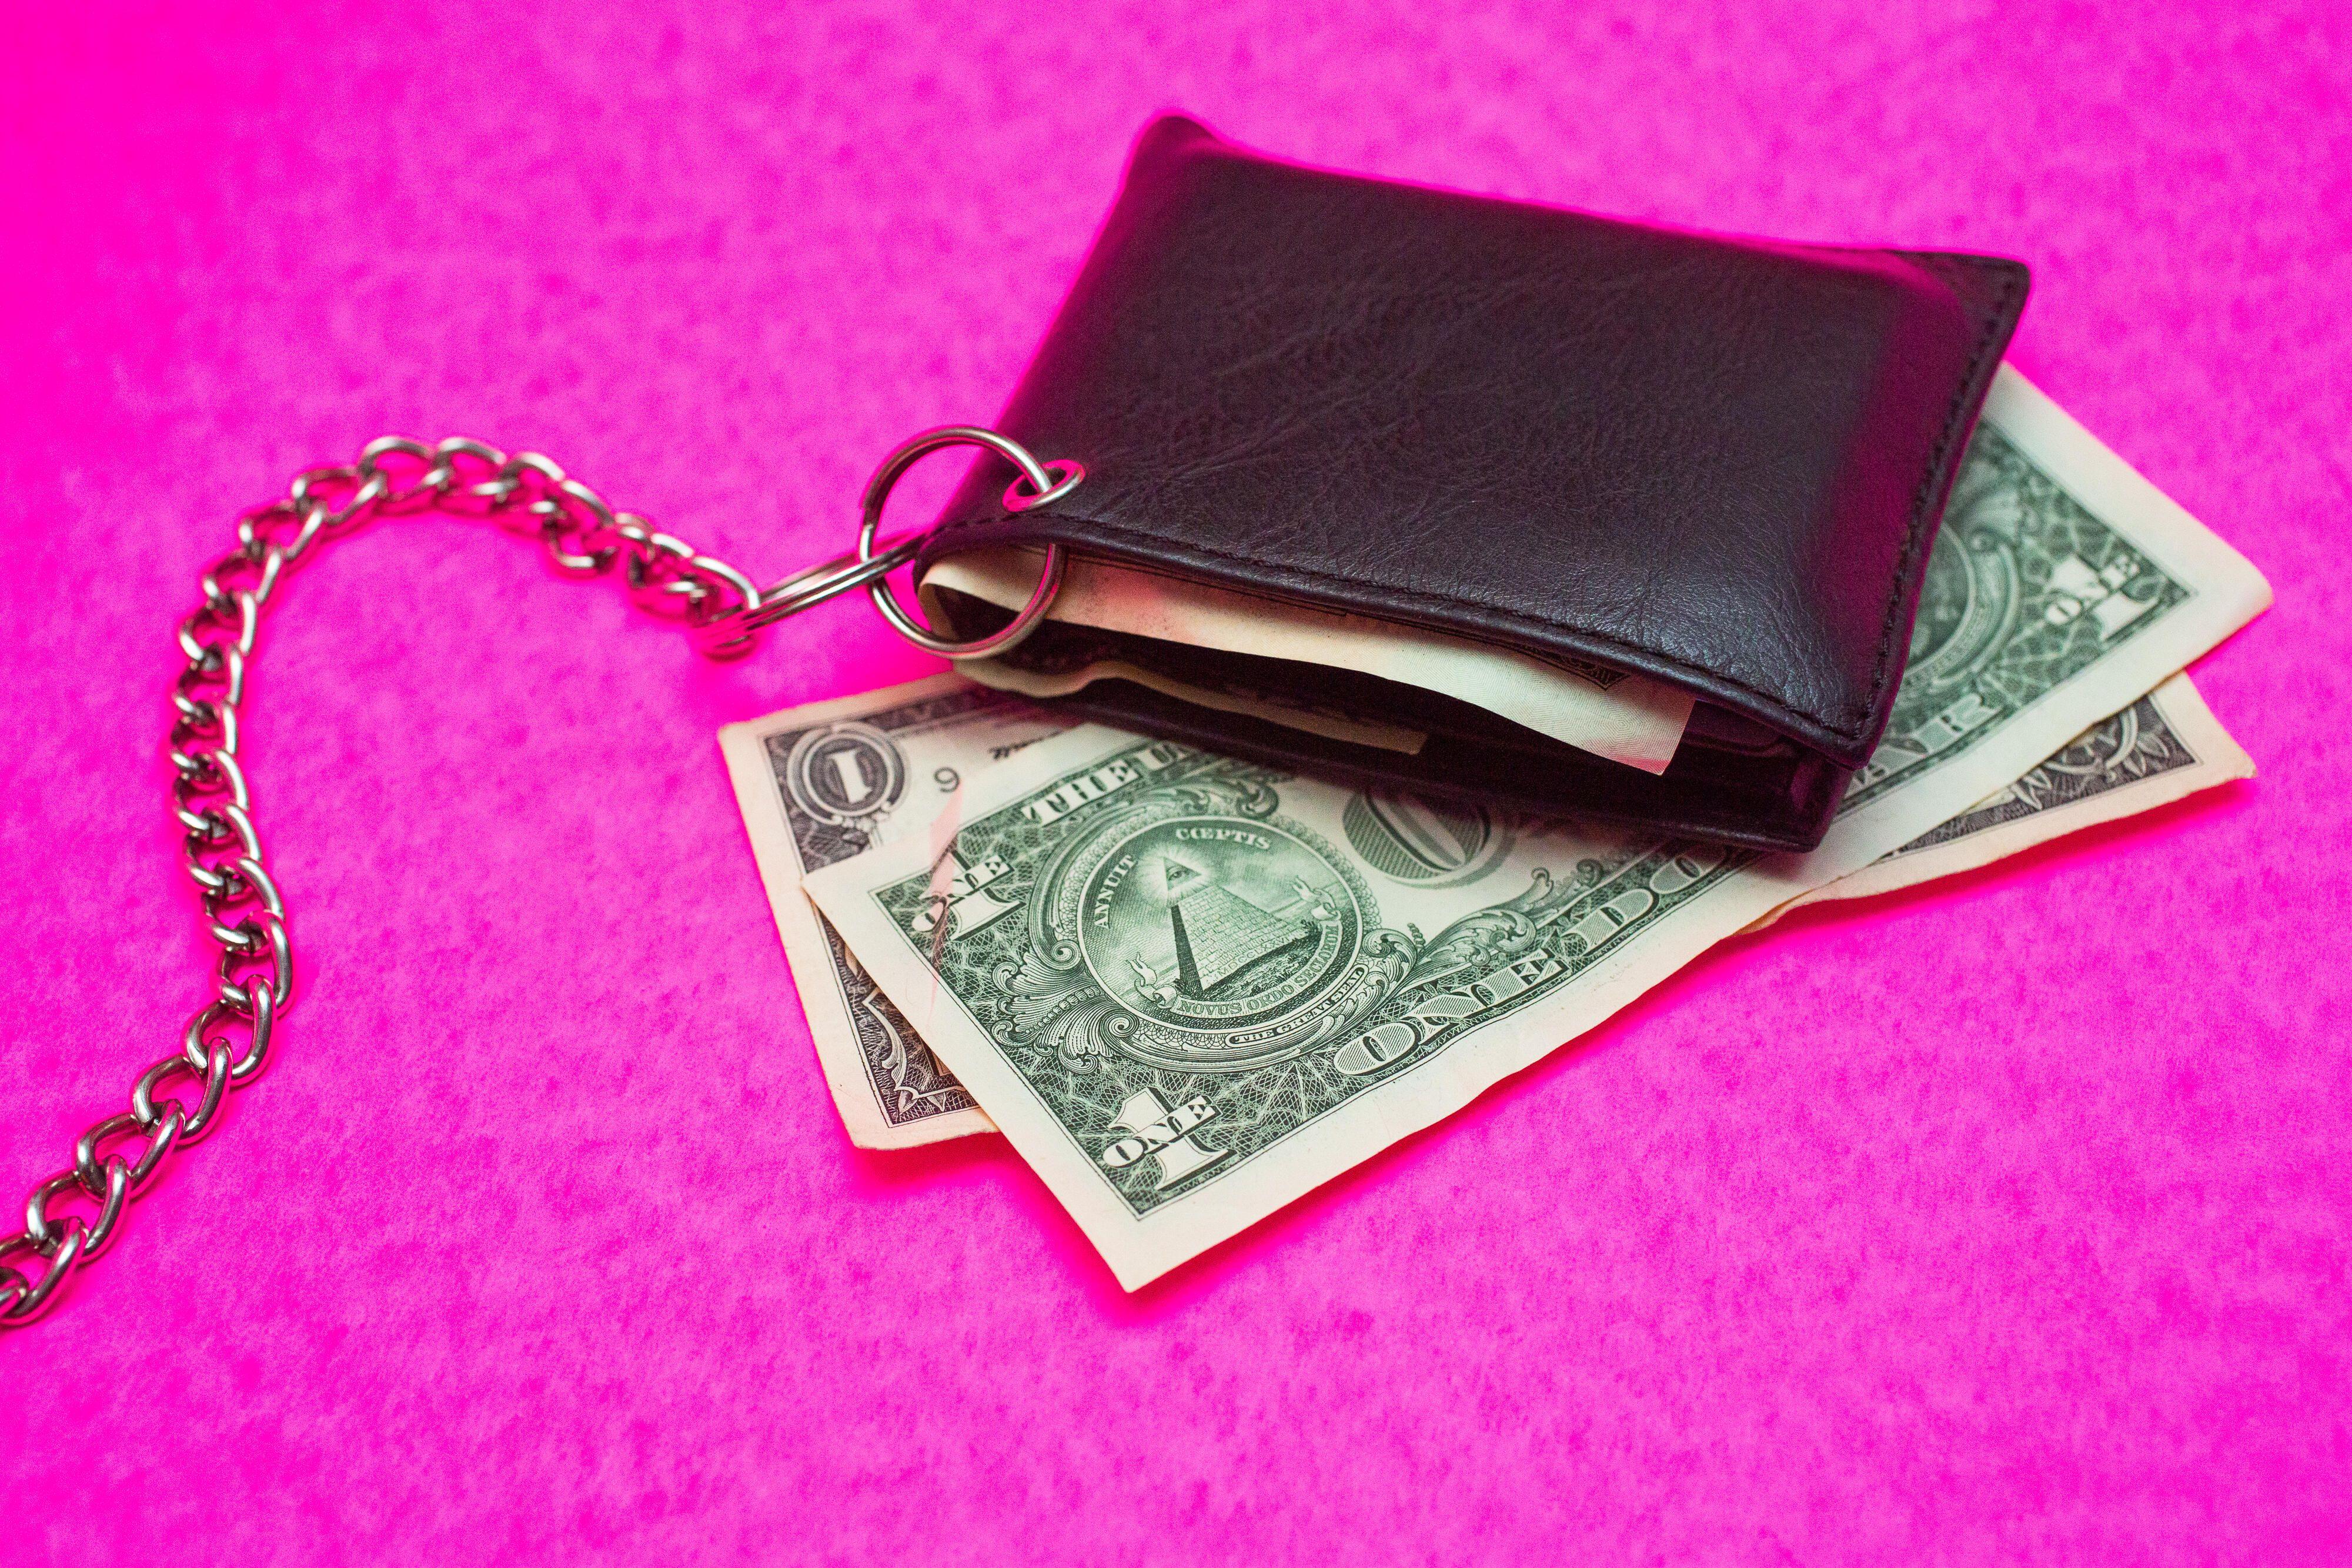 014-cash-stimulus-empty-wallet-economic-crisis-dollar-bill-currency-2020